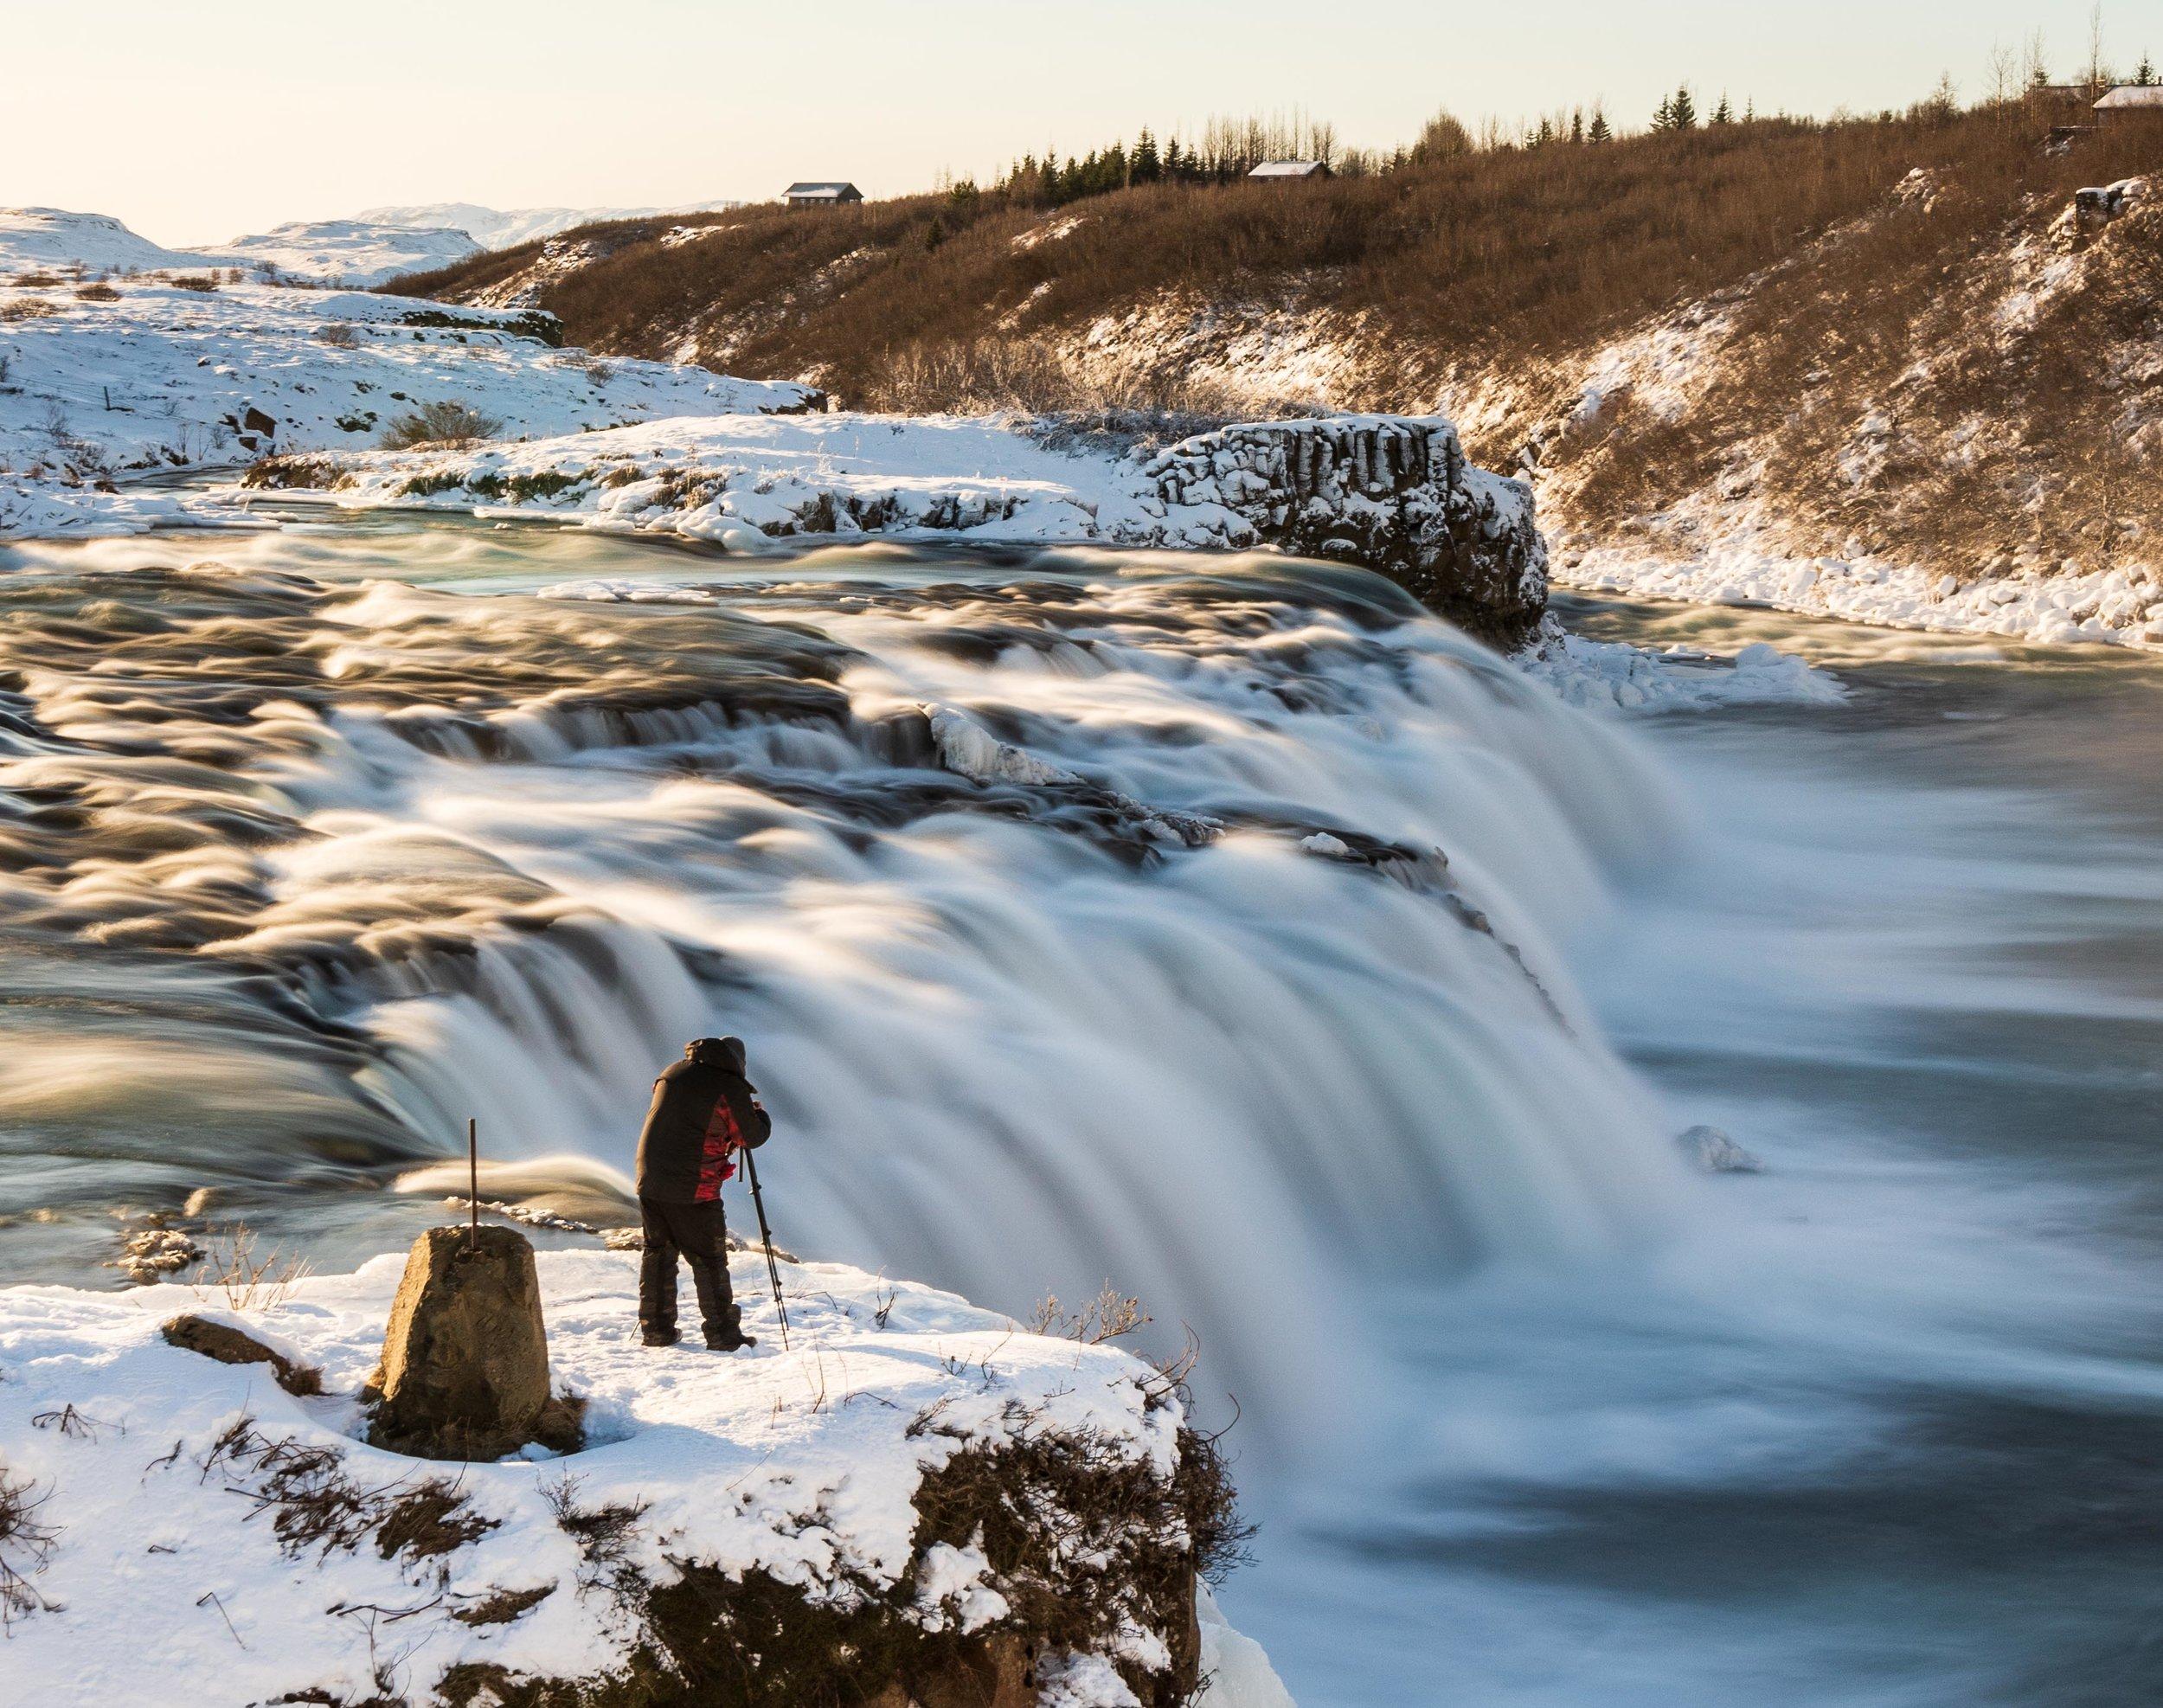 Iceland. snow. travel. adventure. photography. trip. epic landscape. snow. cold. freezing. sunrise. epic photographer.jpg